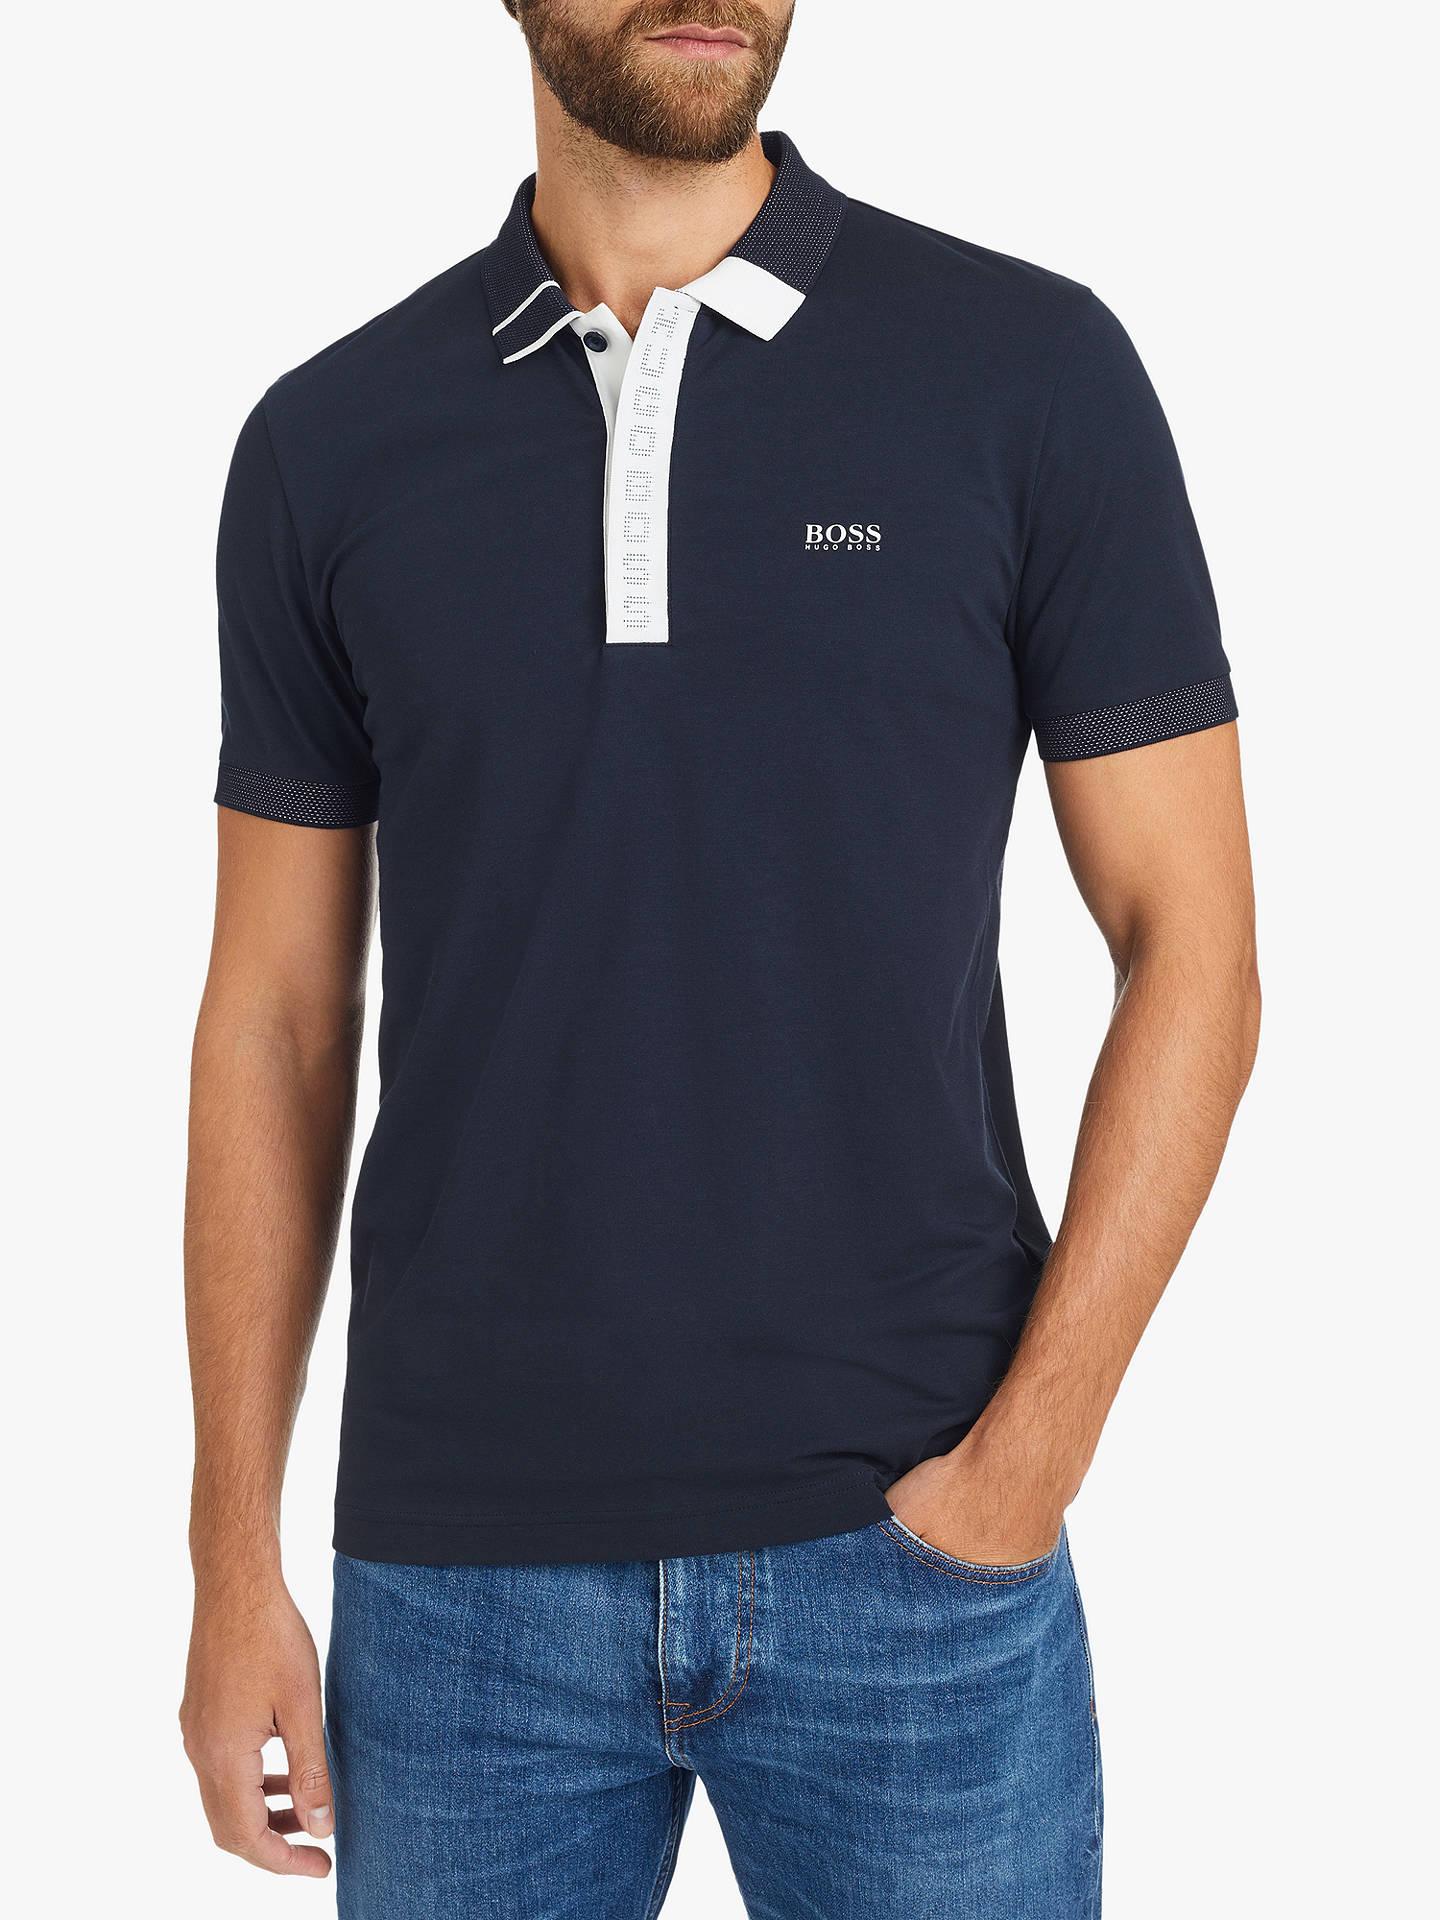 5f301ccae Buy BOSS Paule 2 Polo Shirt, Navy, XL Online at johnlewis.com ...